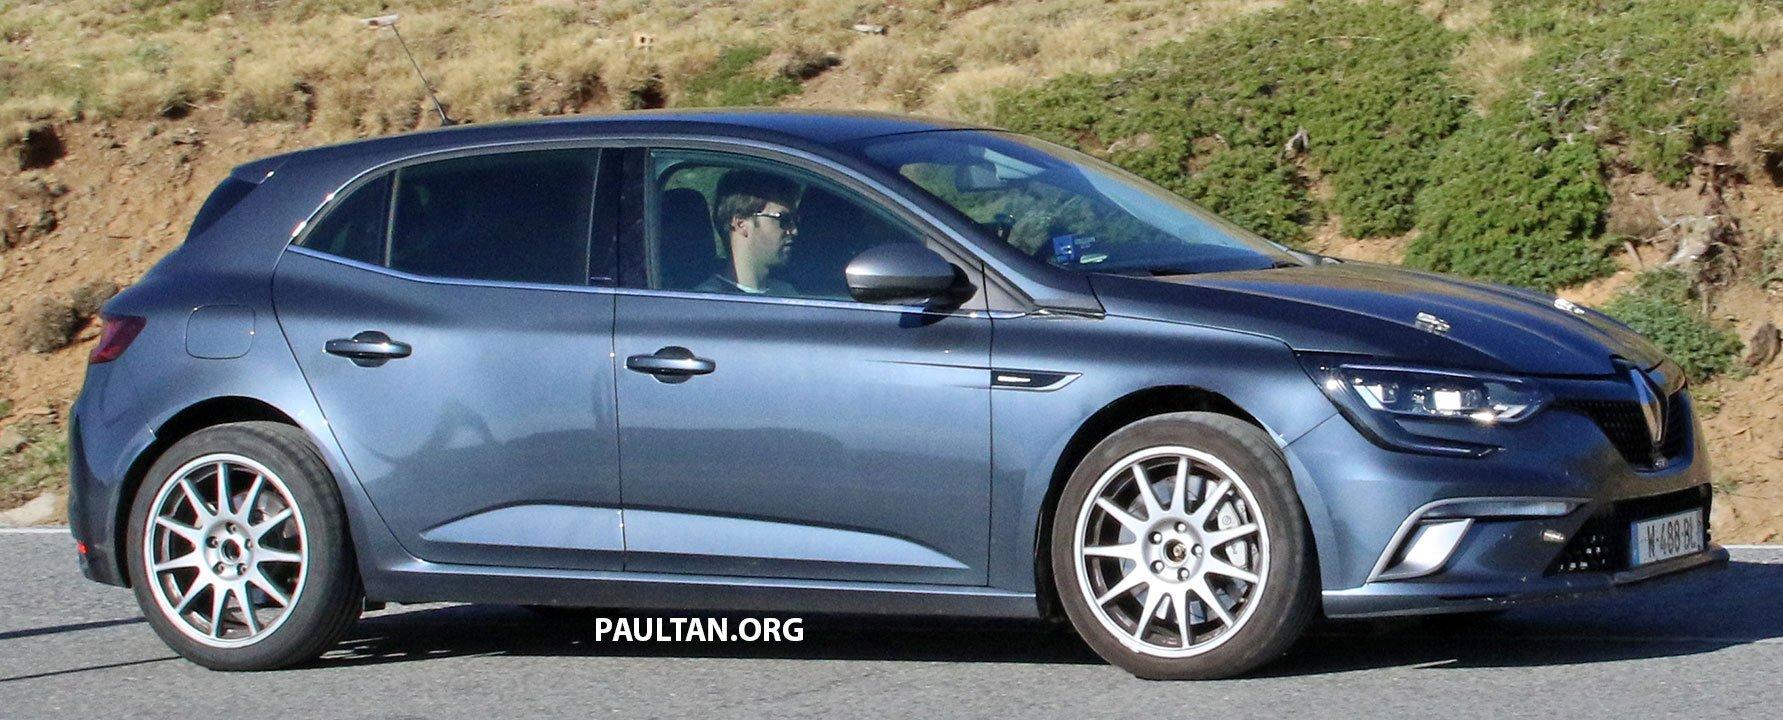 Megane Rs 2018 >> SPIED: Renault Megane RS – AWD, four-wheel steer Paul Tan - Image 520411